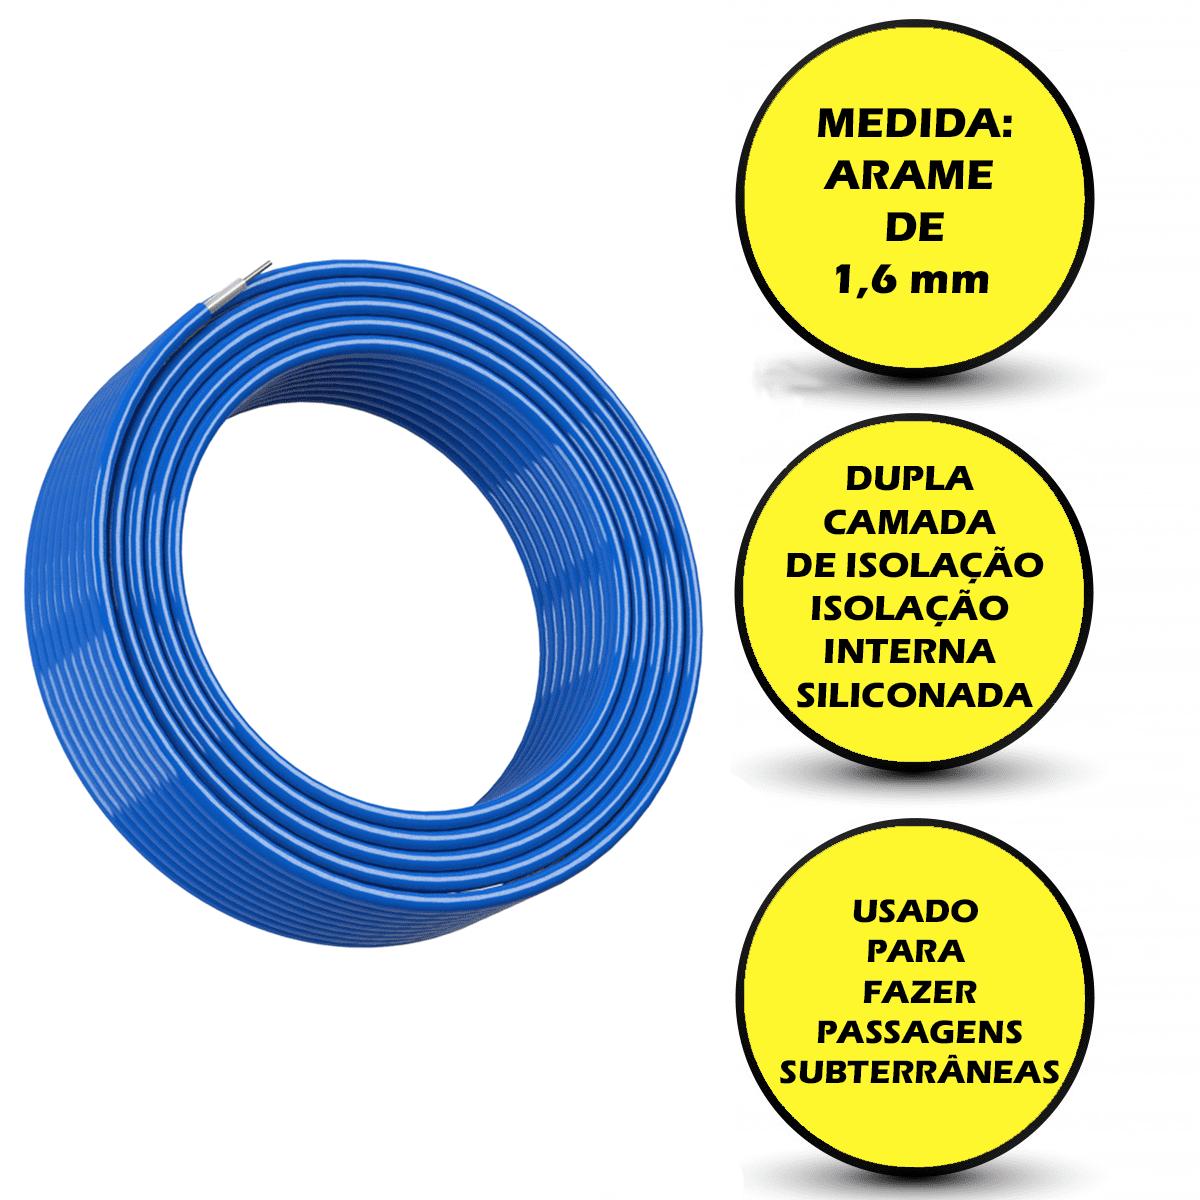 Cabo Subterraneo Para Cerca Eletrica Rural Super Reforçado 50 Metros  - Ambientude Agro e Pet